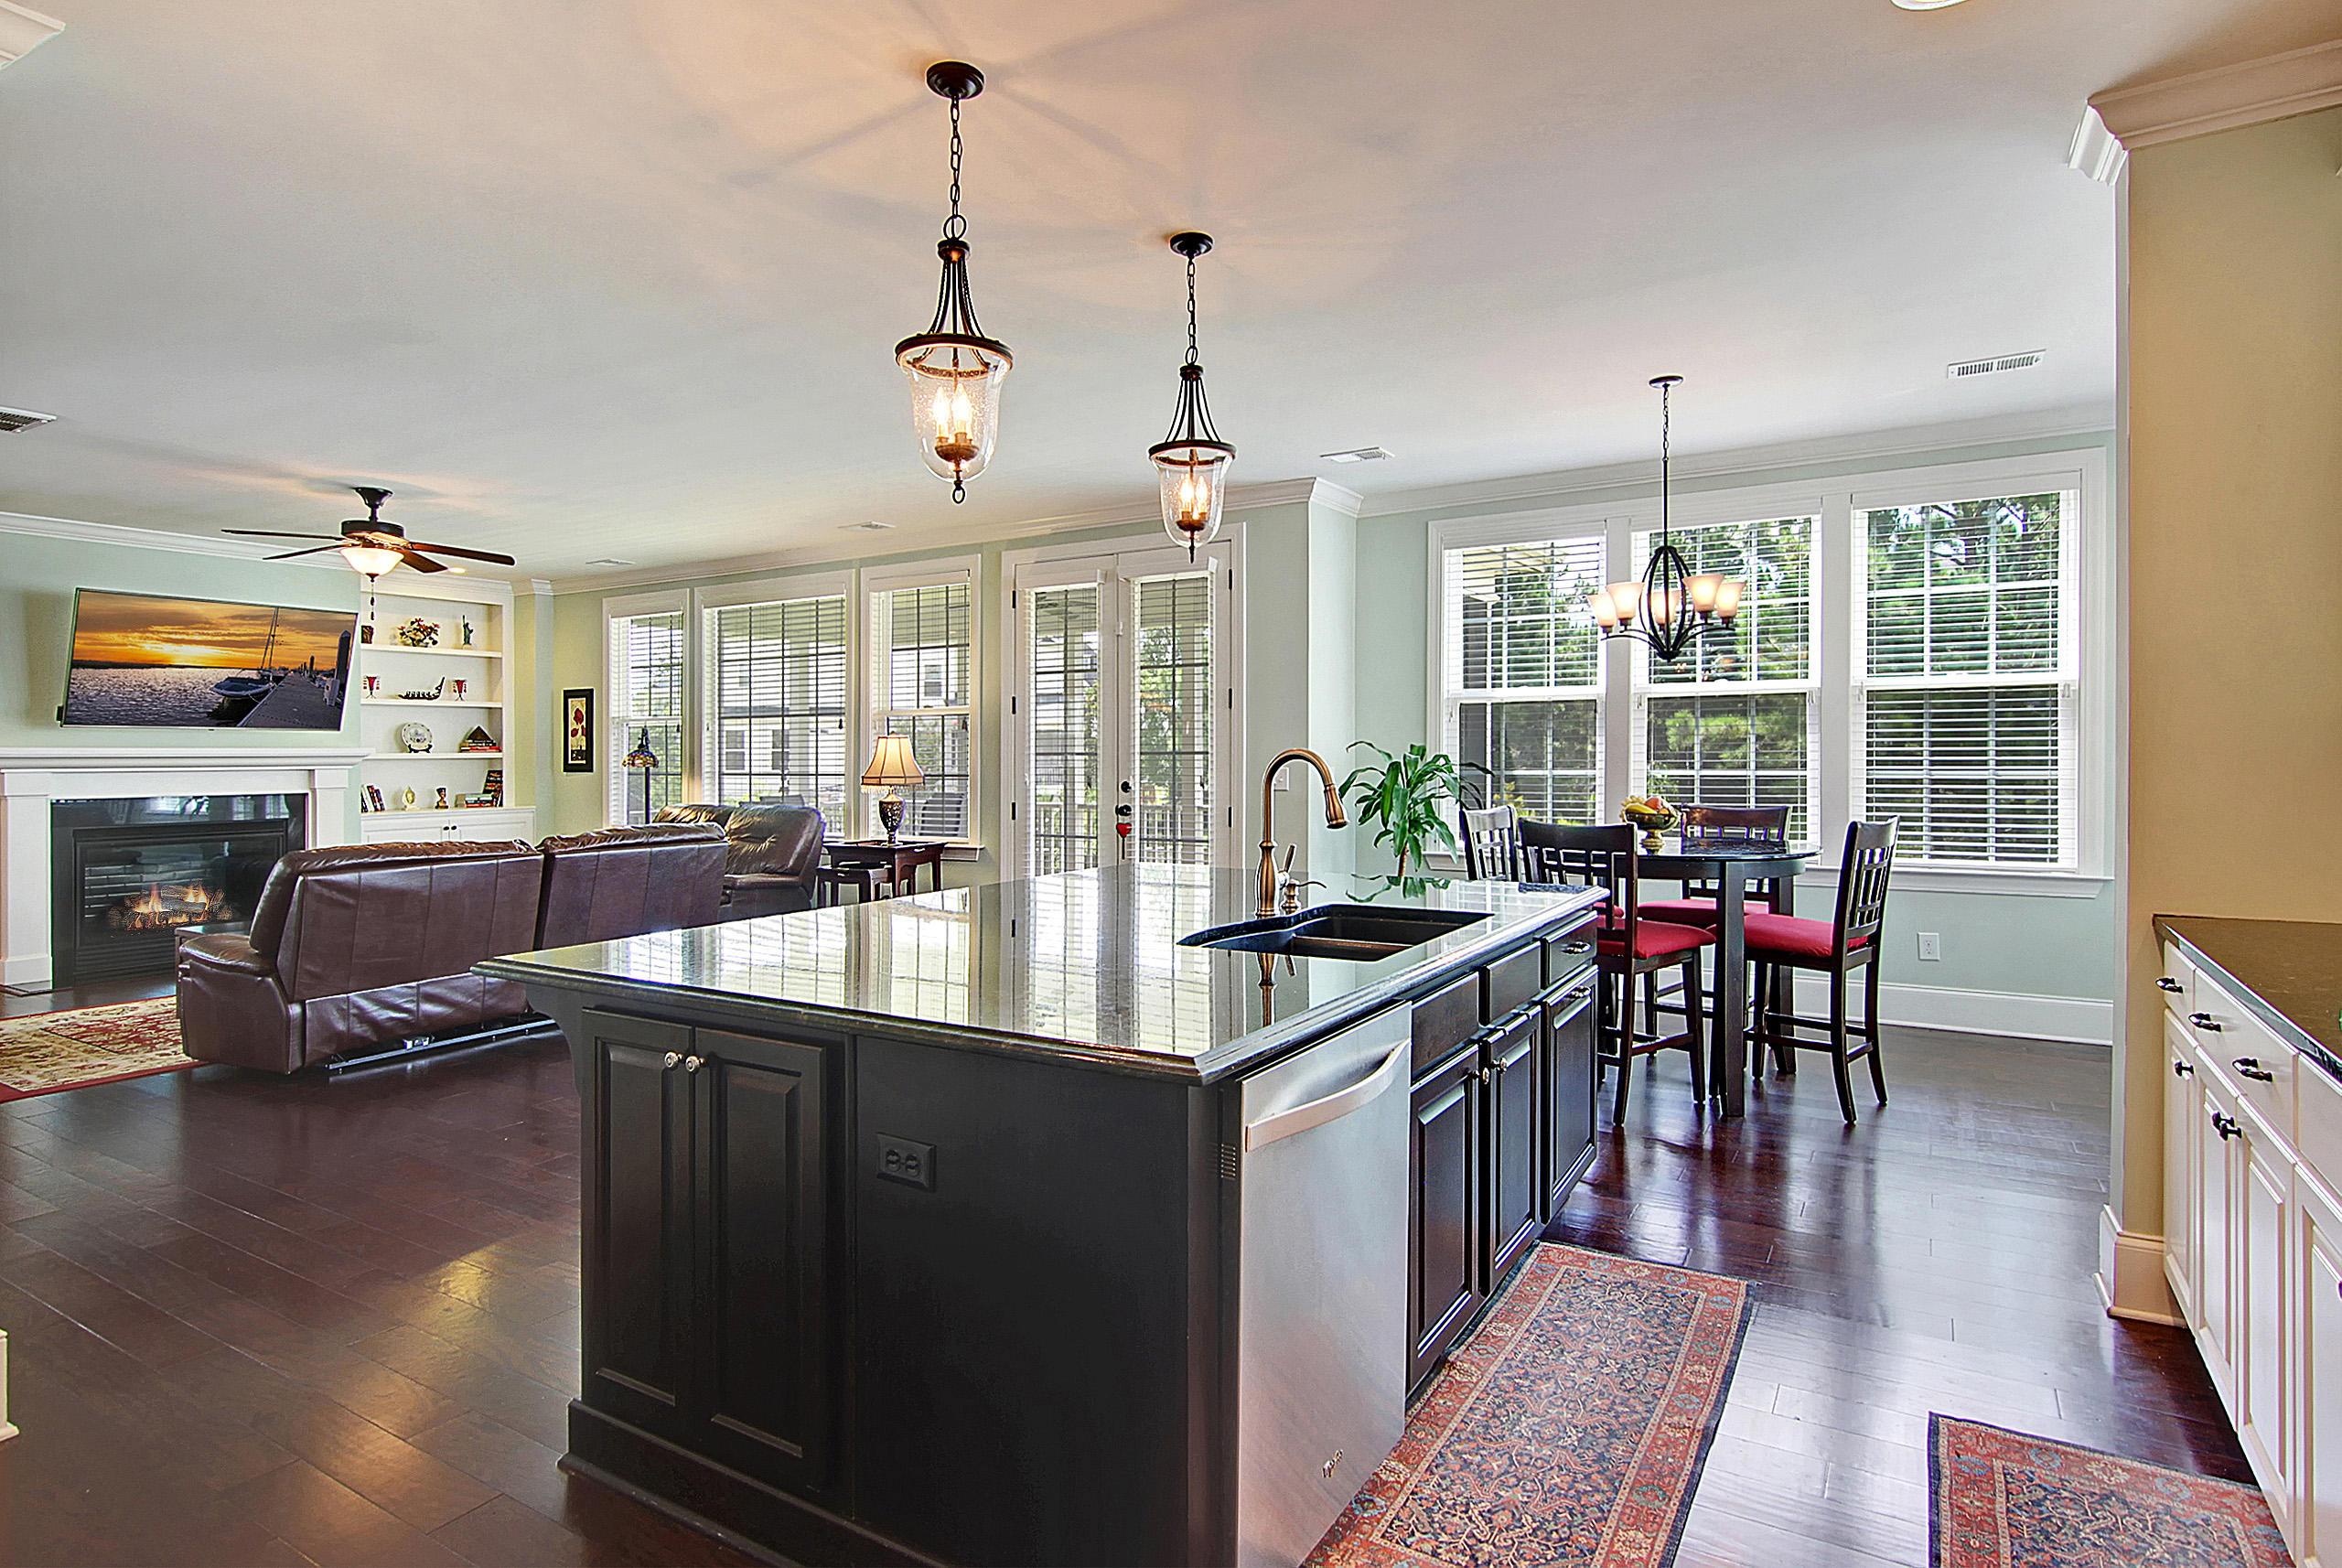 Dunes West Homes For Sale - 1332 Whisker Pole, Mount Pleasant, SC - 14